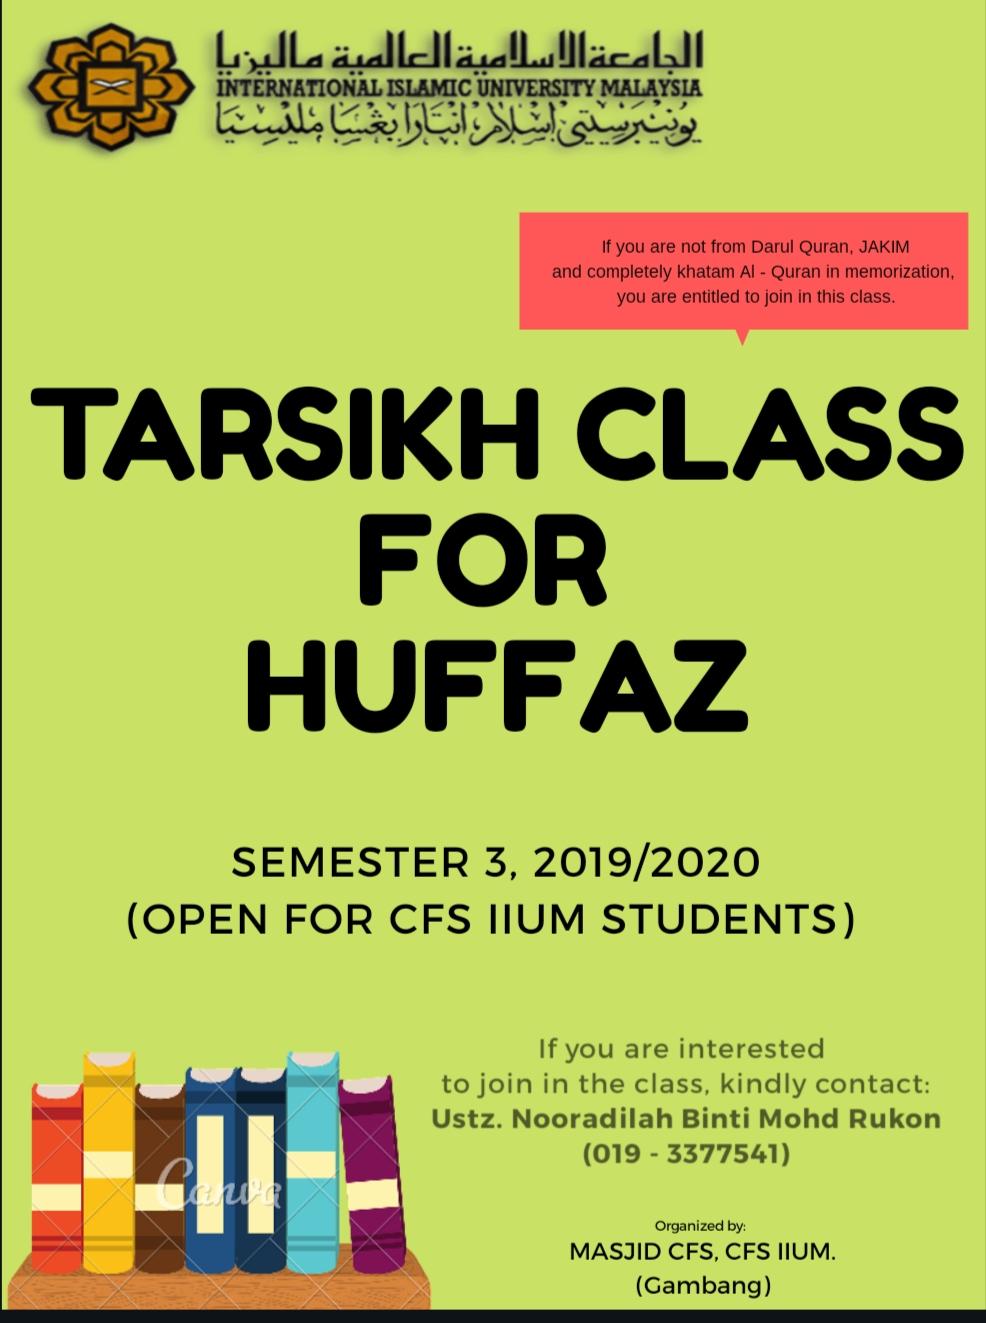 TARSIKH CLASS FOR CFS STUDENTS SEMESTER 3, 2019/2020